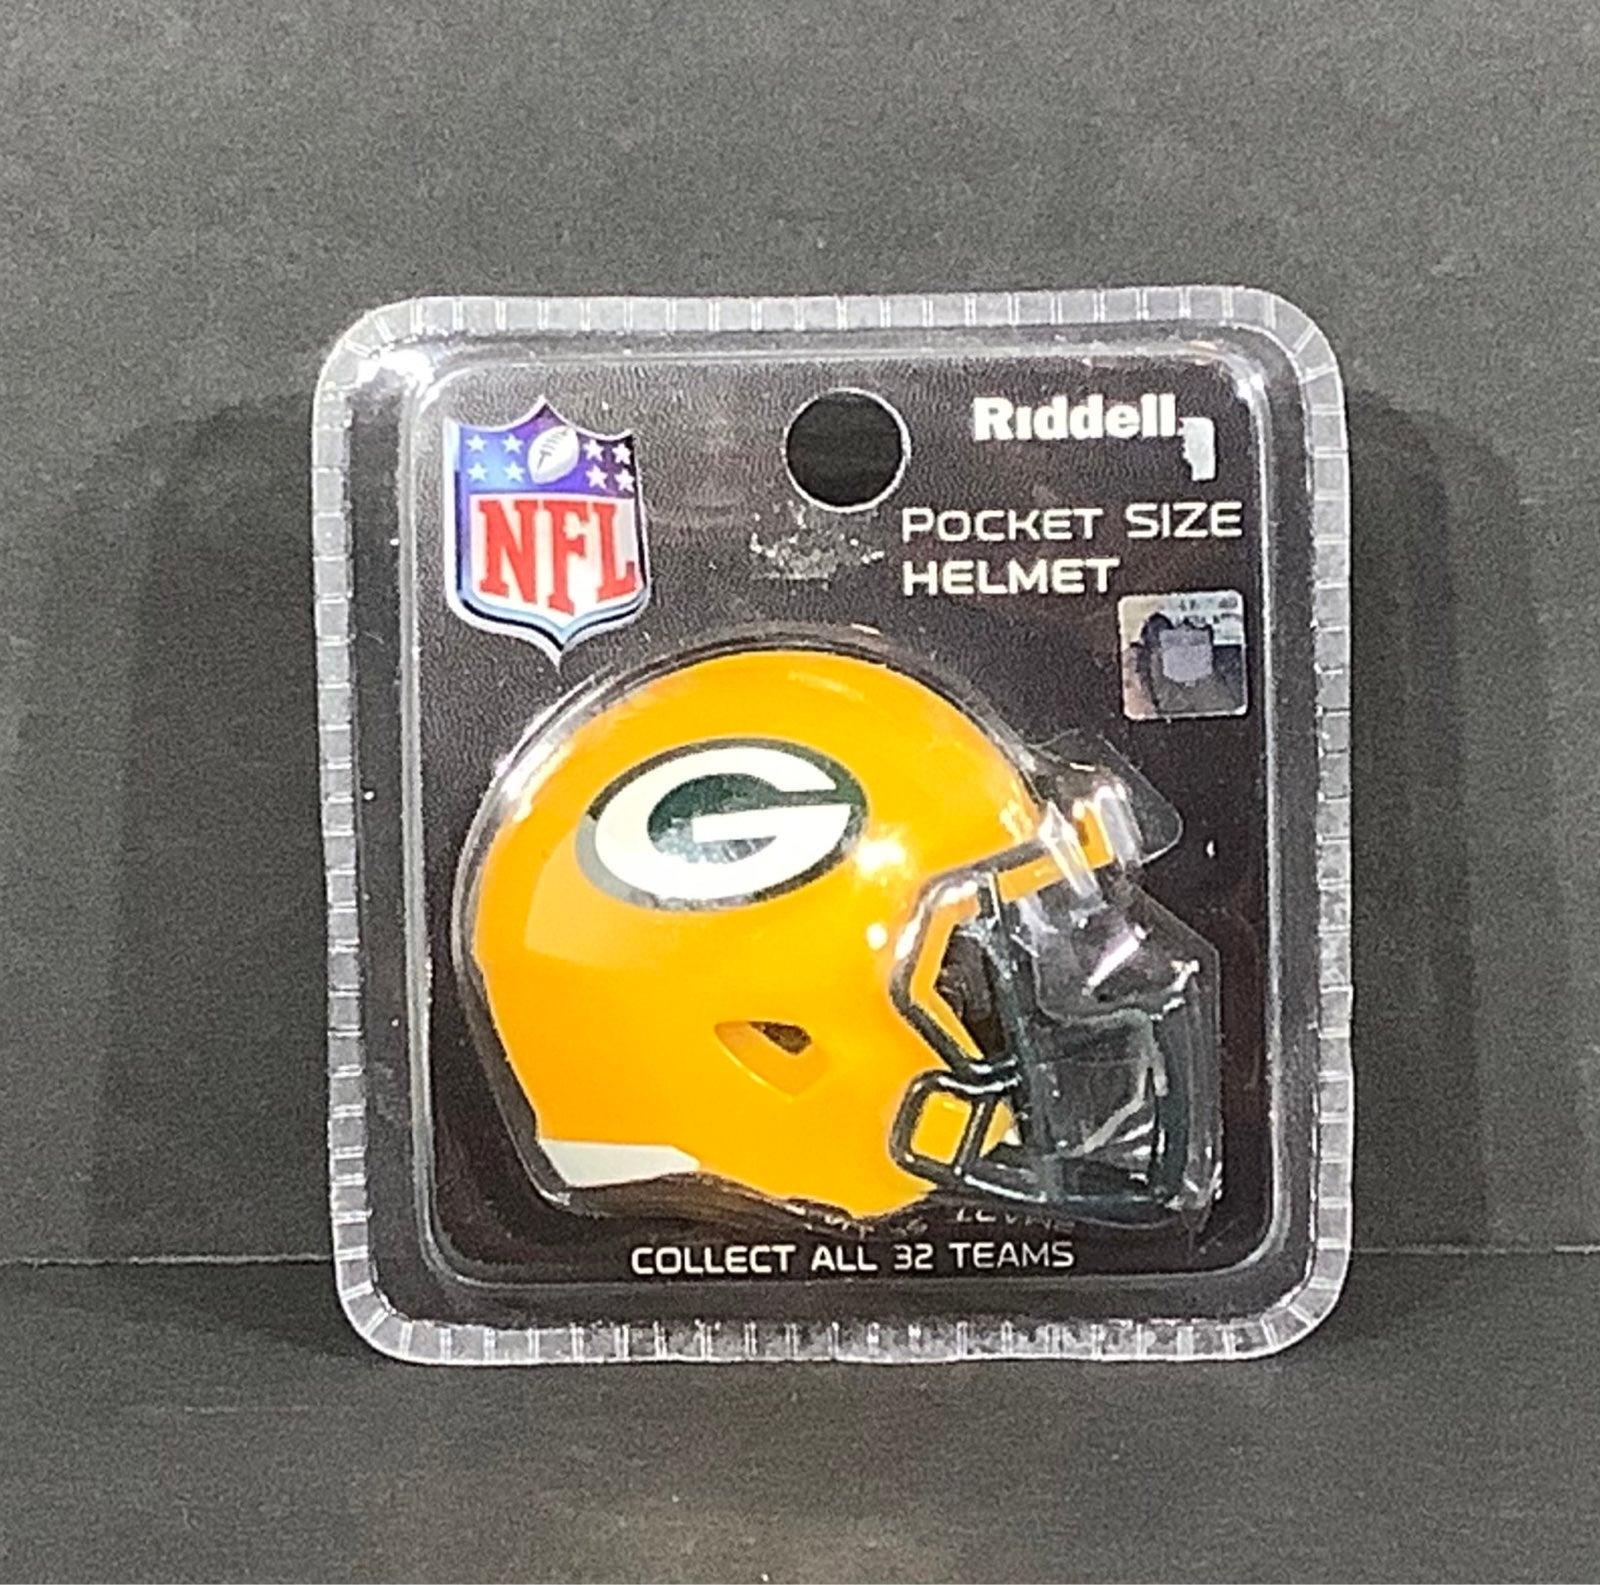 Green Bay Packers NFL Riddell Pocket Pro